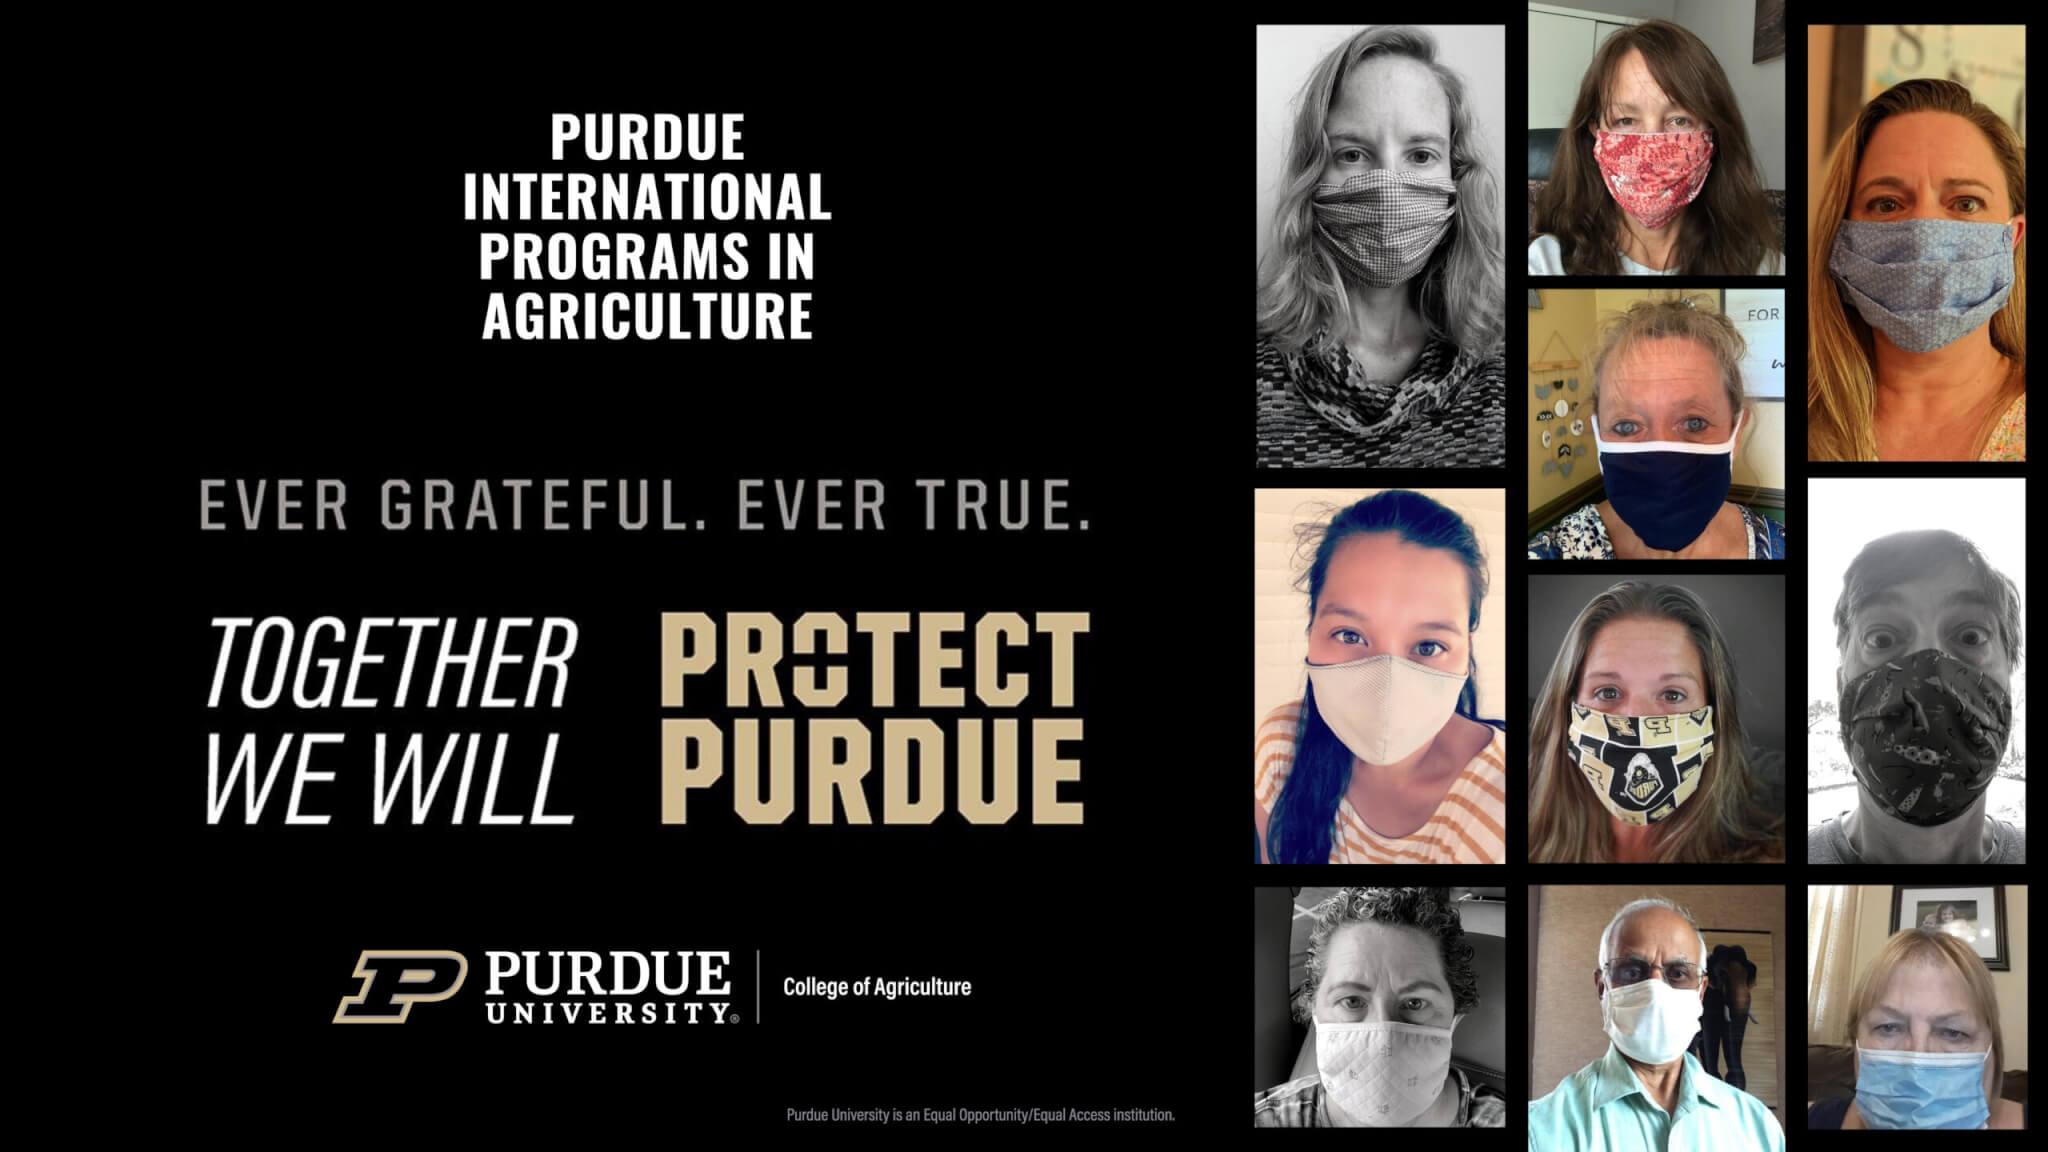 The IPIA team showing off their masks. Left to right: Kara Hartman, Julie Hancock, Trish Sipes, Nyssa Lilovich, Lynn Cornell, Jerry Shively, Amanda Dickson, Carole Braund, Kashchandra Raghothama, and Ruth Ann Bowles.